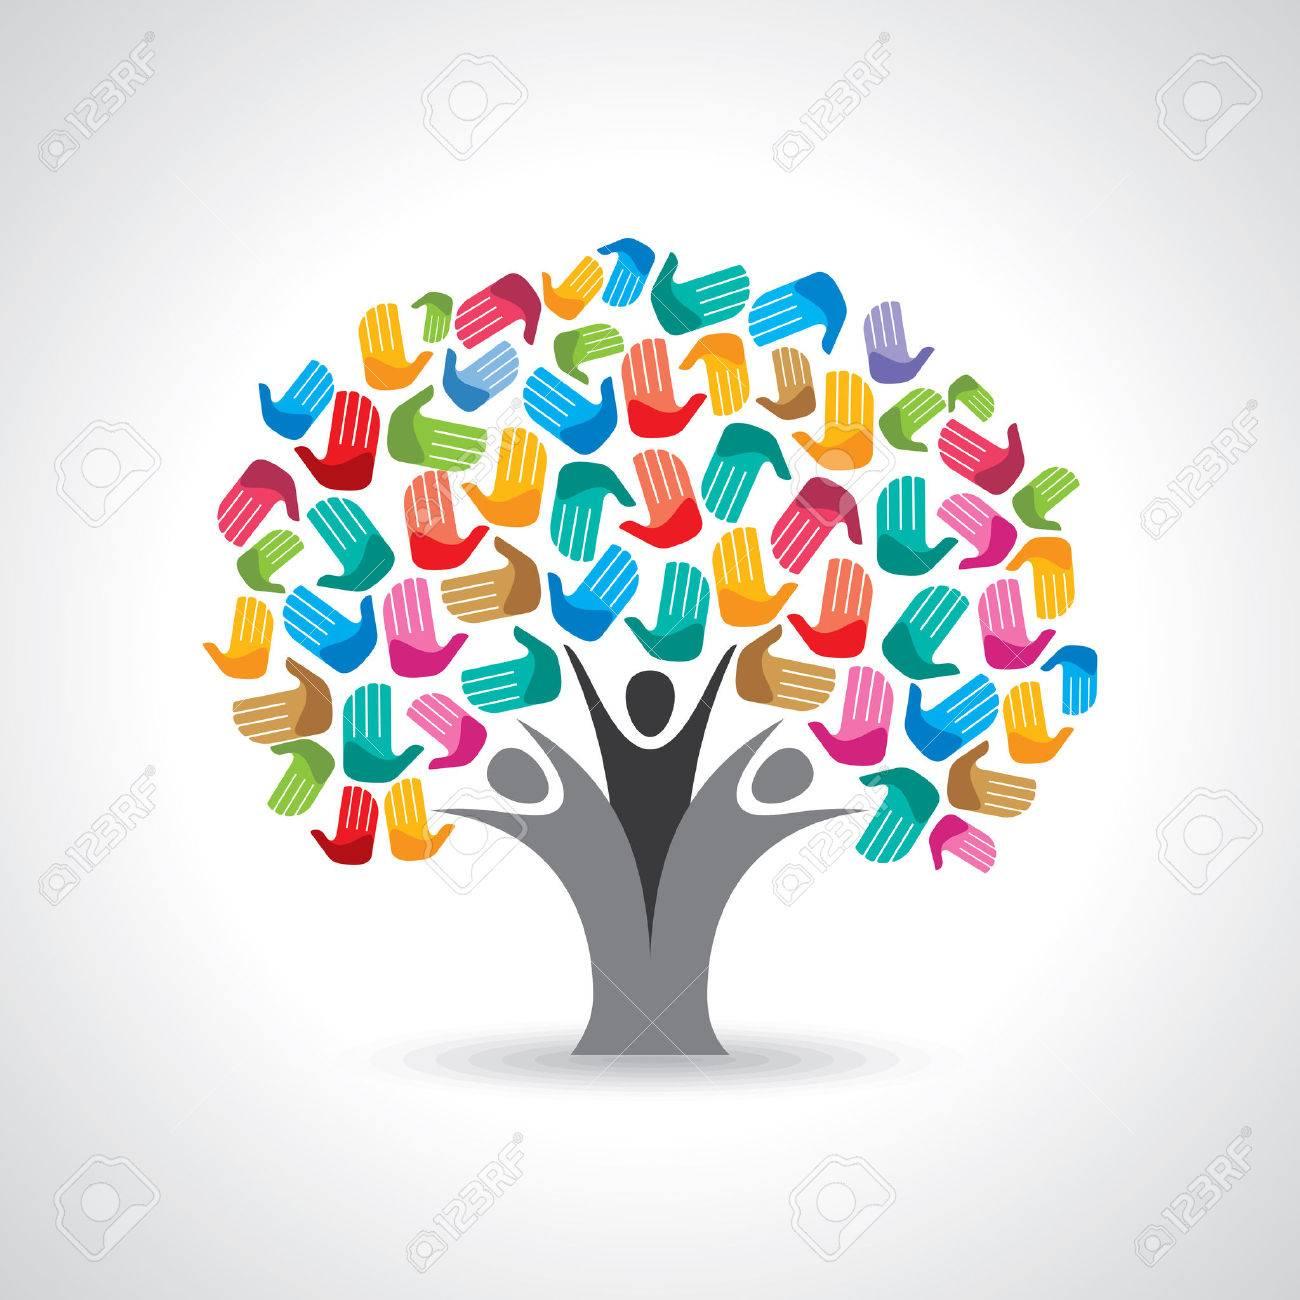 Isolated diversity tree hands illustration. Standard-Bild - 37110190